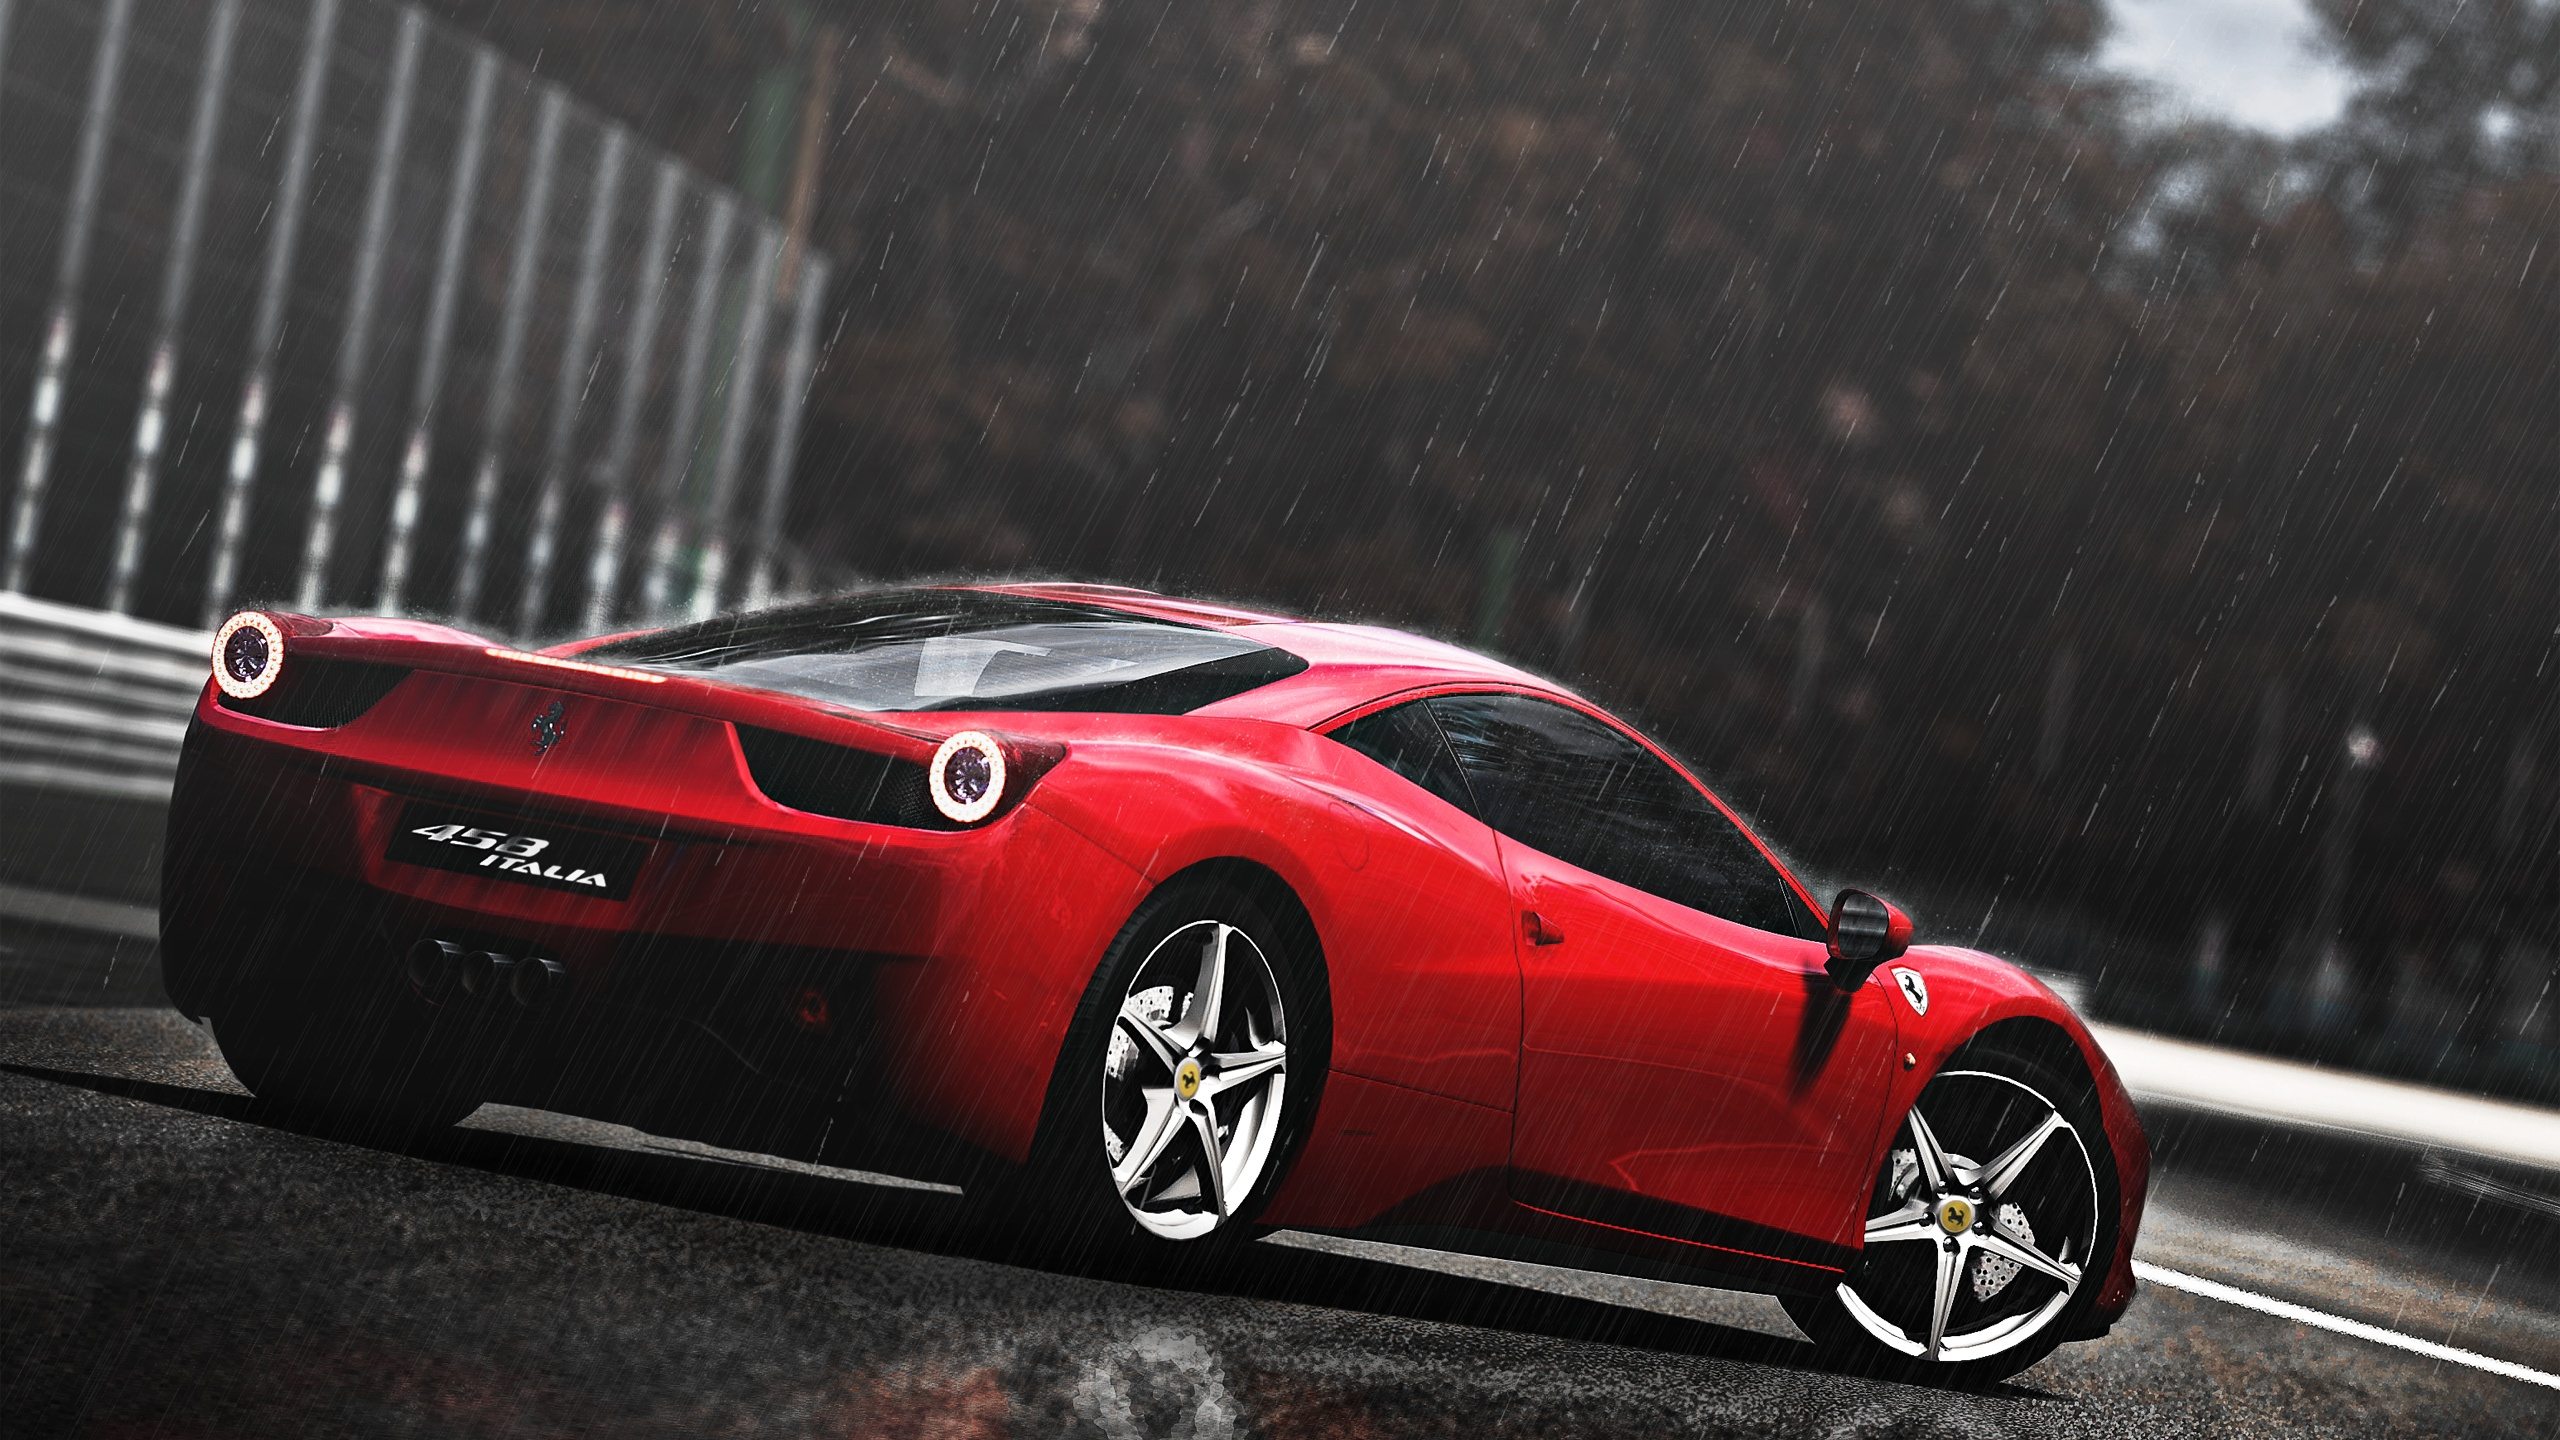 Download Ferrari 458 Wallpaper 37612 2560x1440 Px High Definition